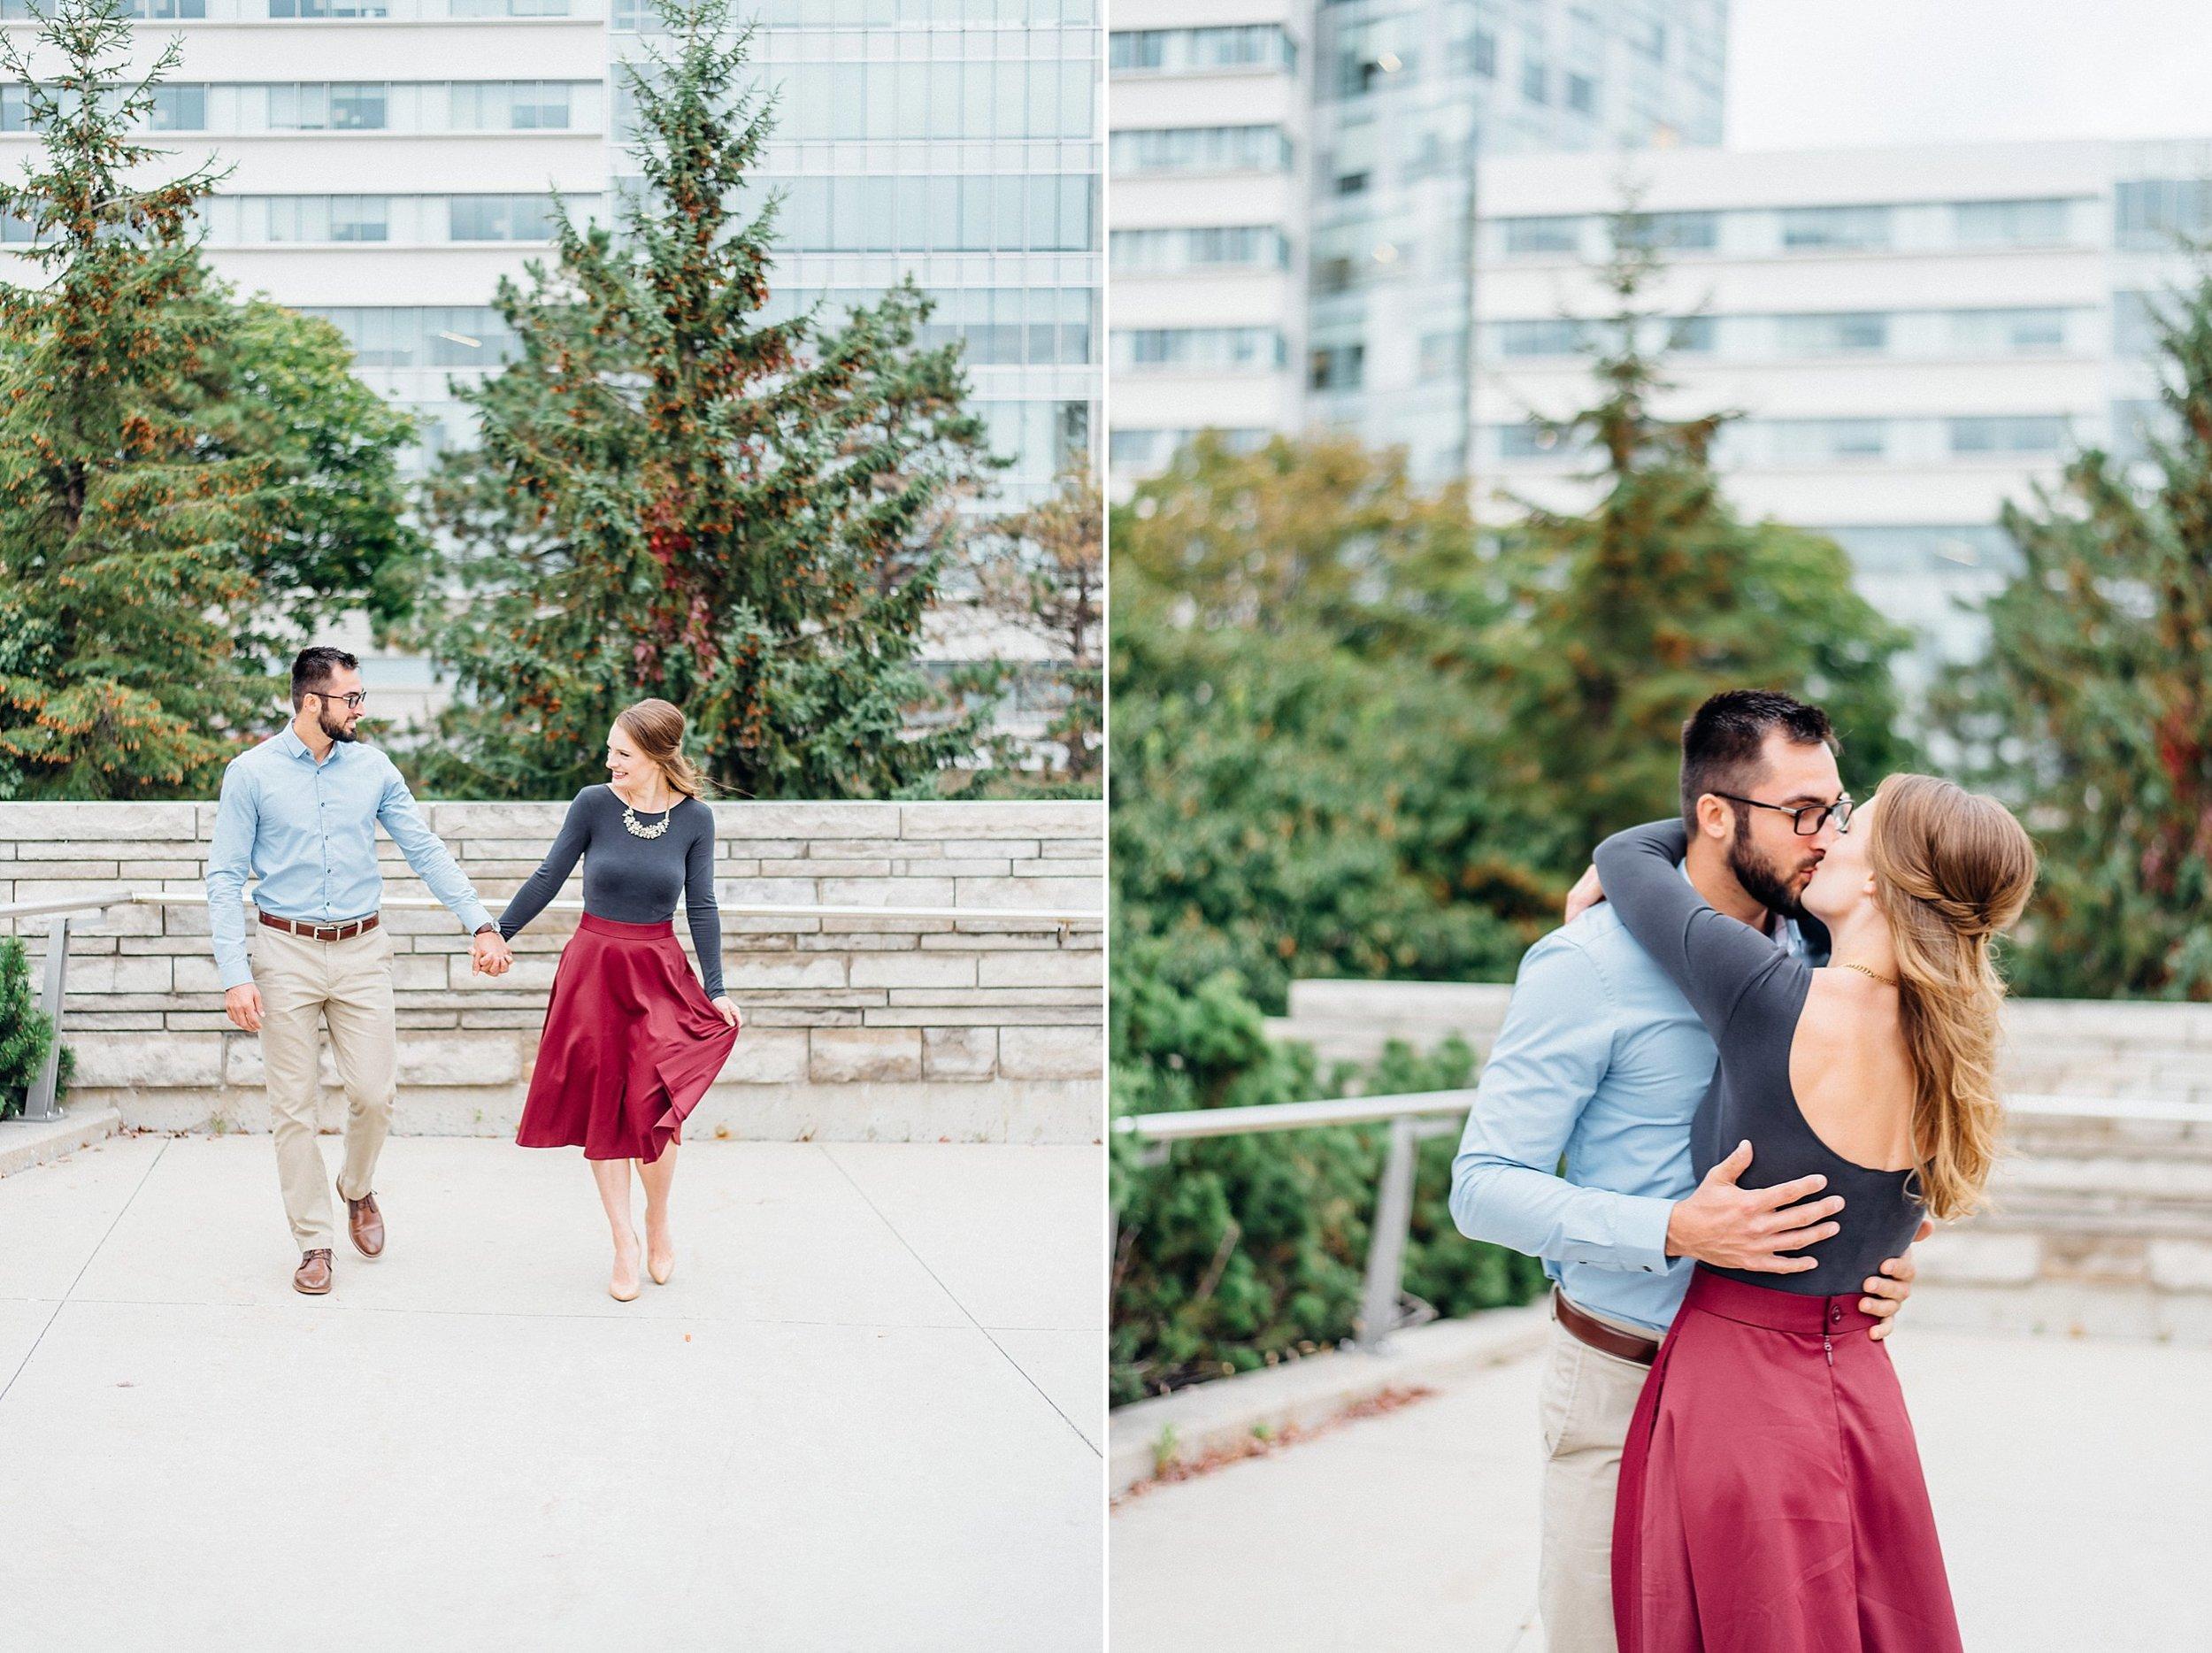 Ali and Batoul Photography - light, airy, indie documentary Ottawa wedding photographer_0132.jpg